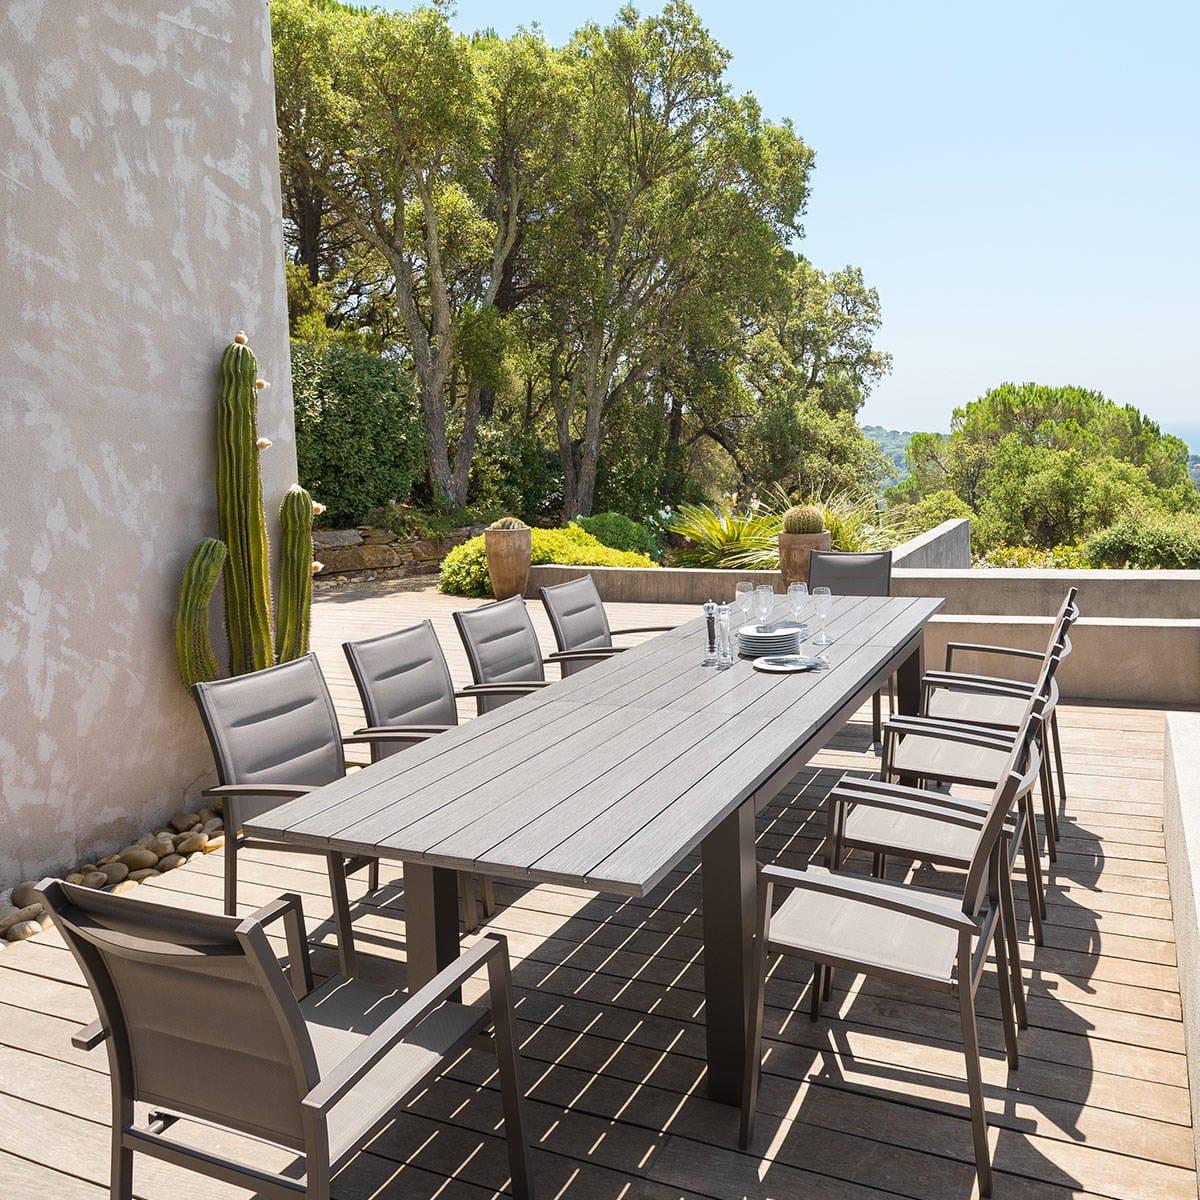 Table De Jardin Modulable – Nieuwste Woninginrichting destiné Auchan Table De Jardin